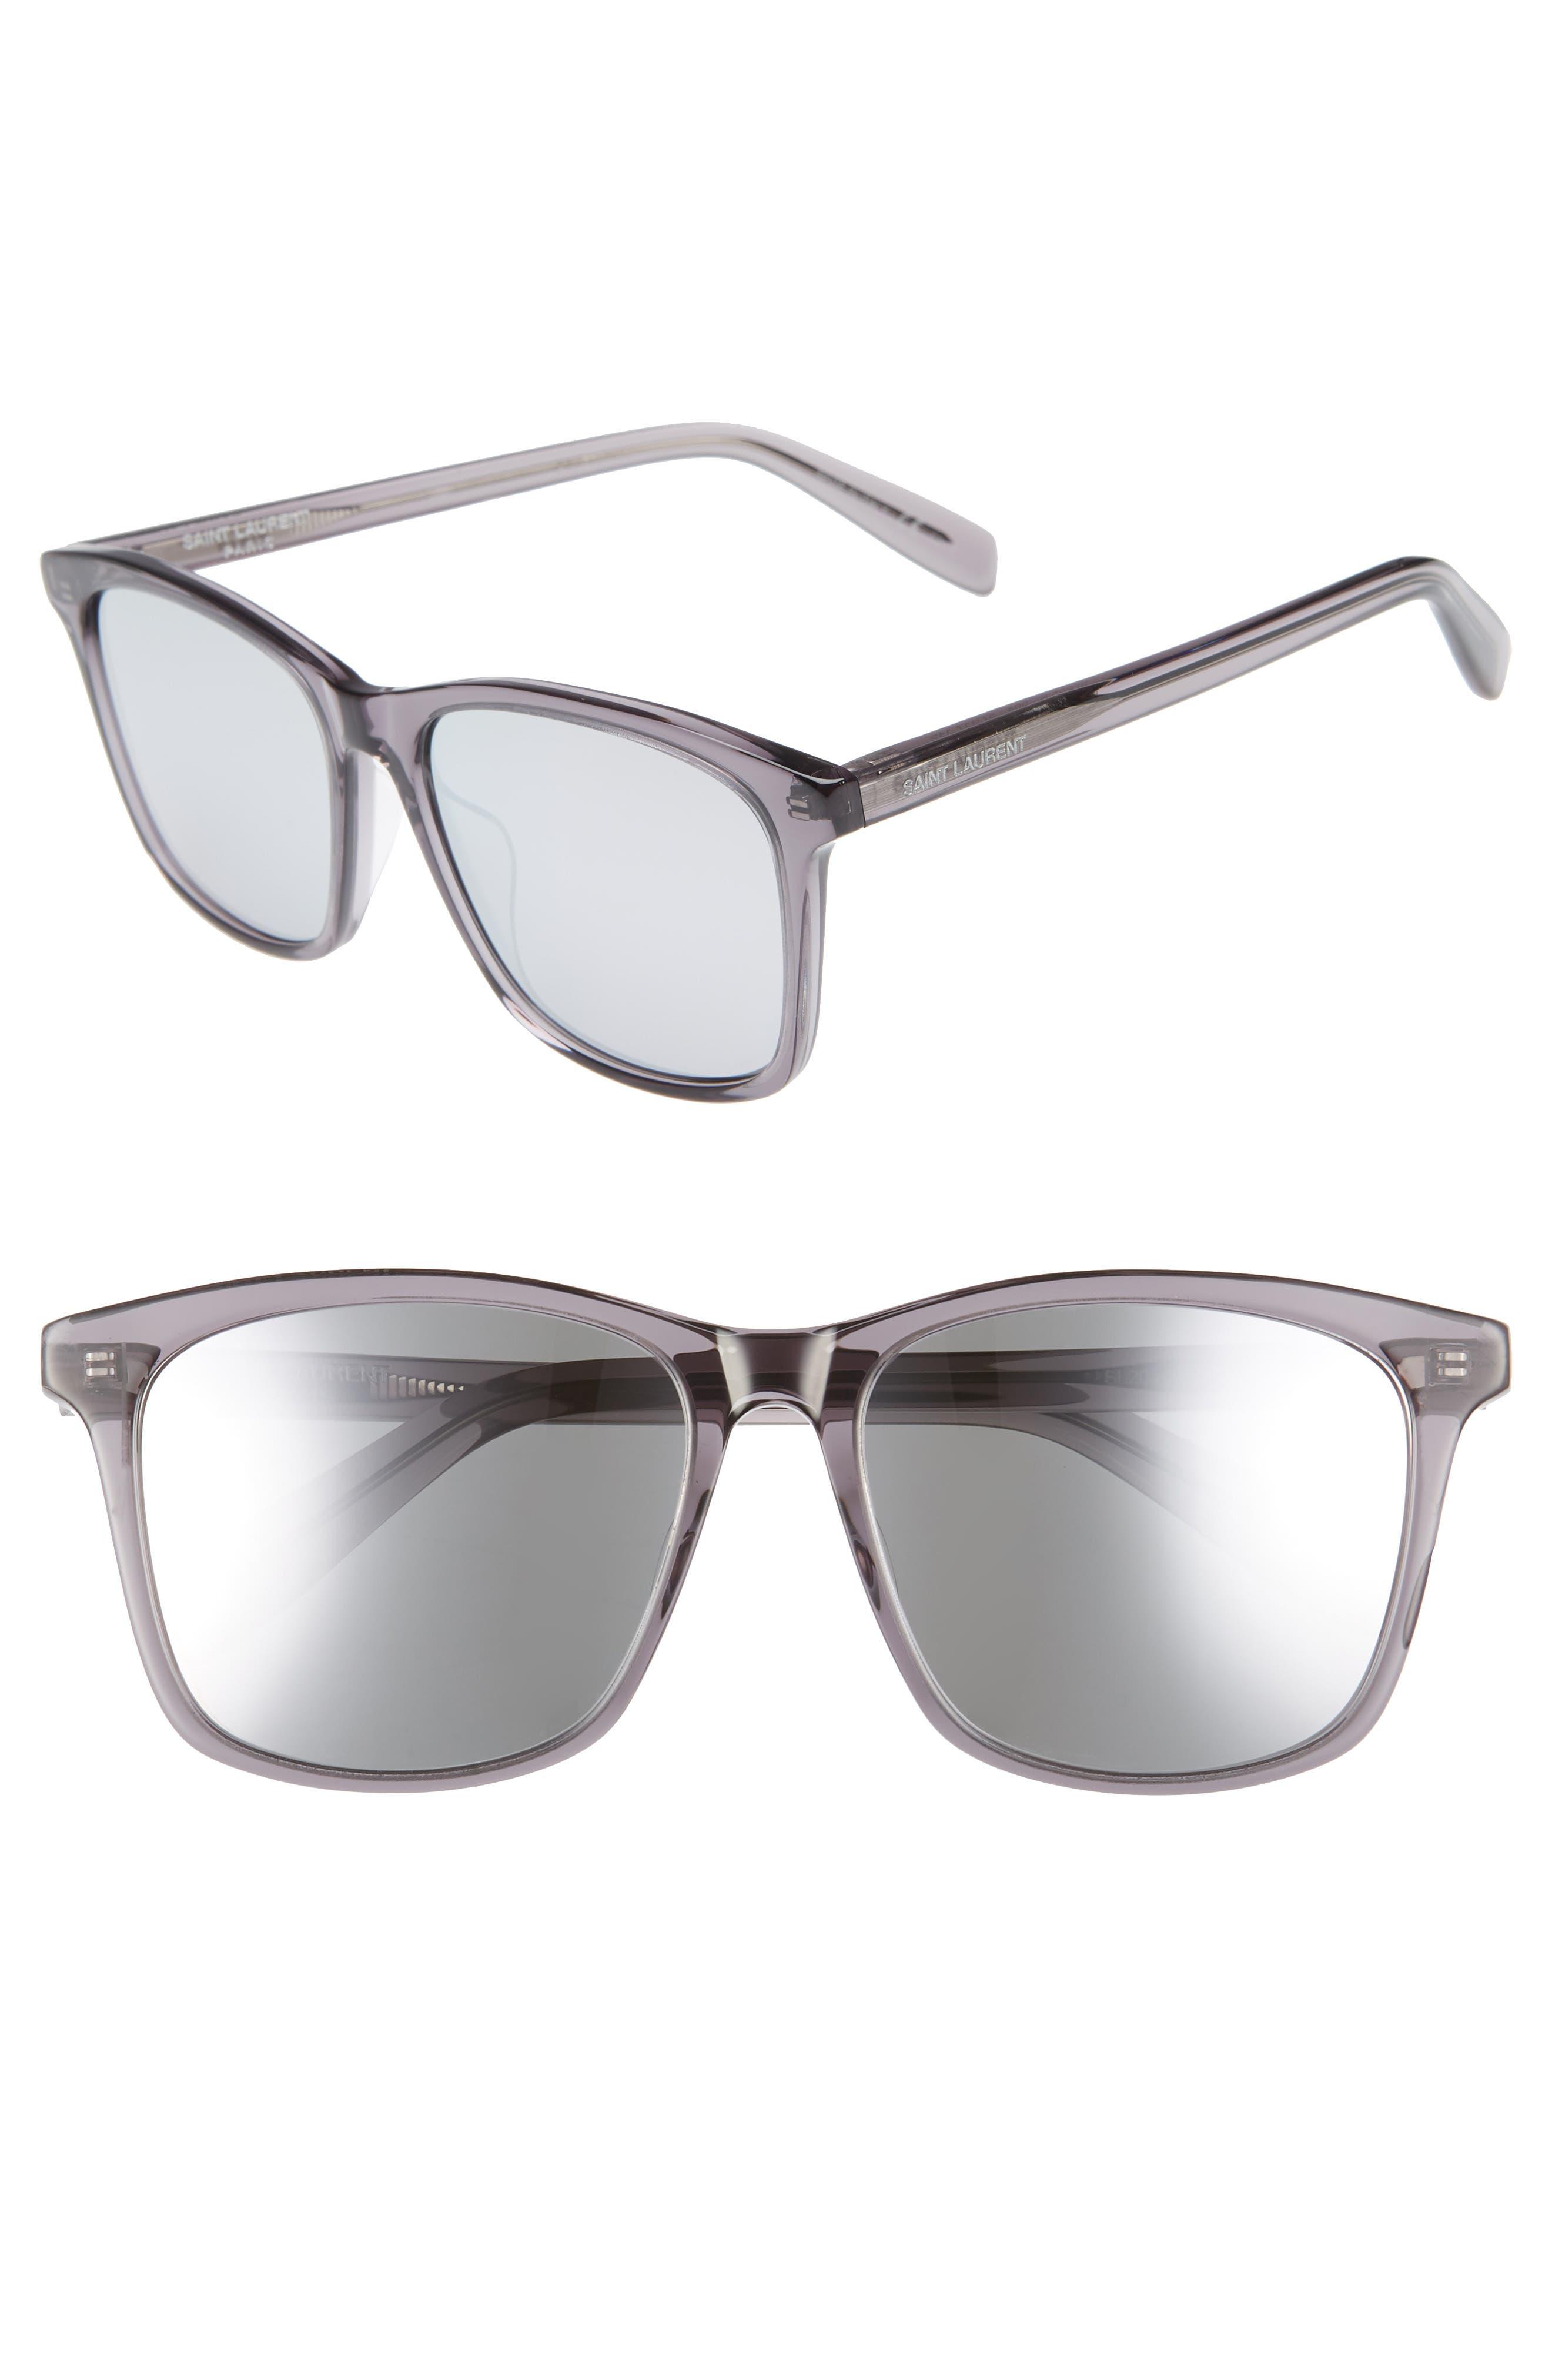 205/K 57mm Sunglasses,                             Main thumbnail 1, color,                             GREY